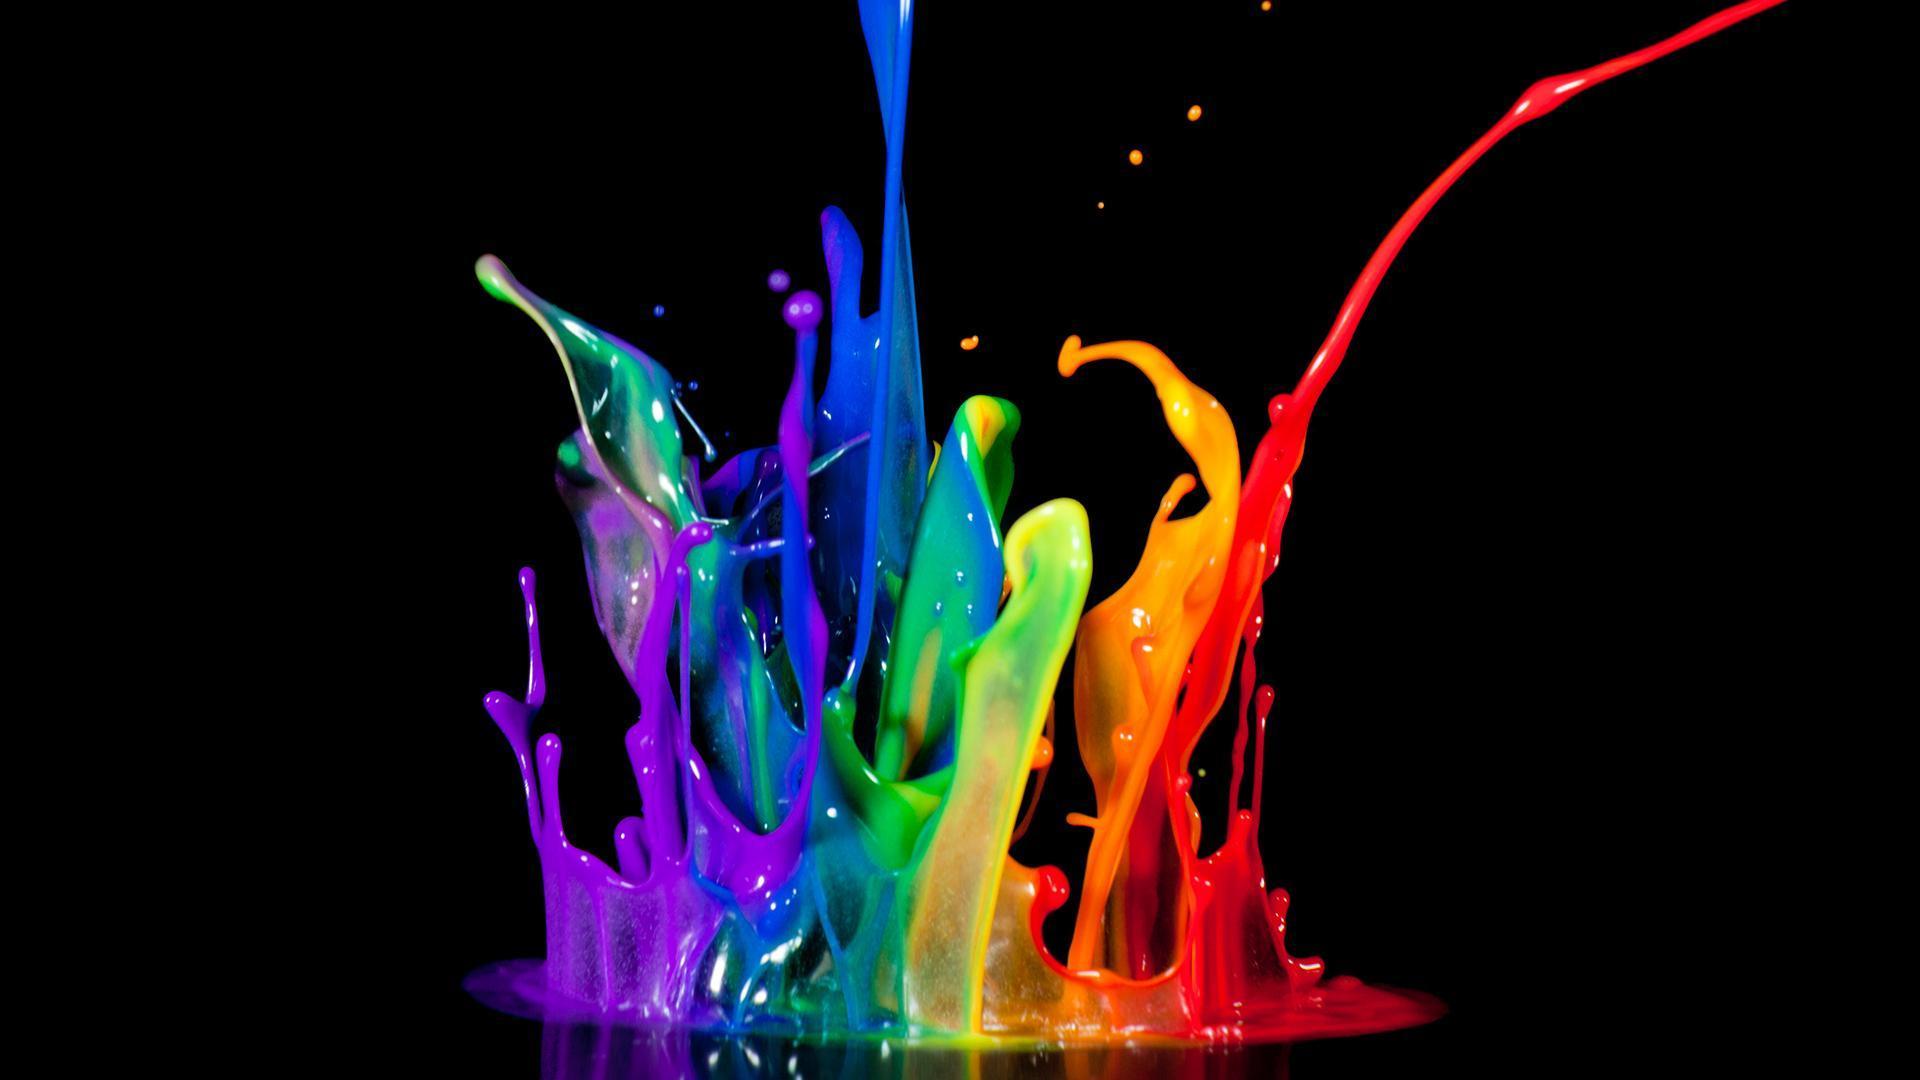 Related Pictures 3d Color Splash Wallpapers Wallpaper Hd Desktop